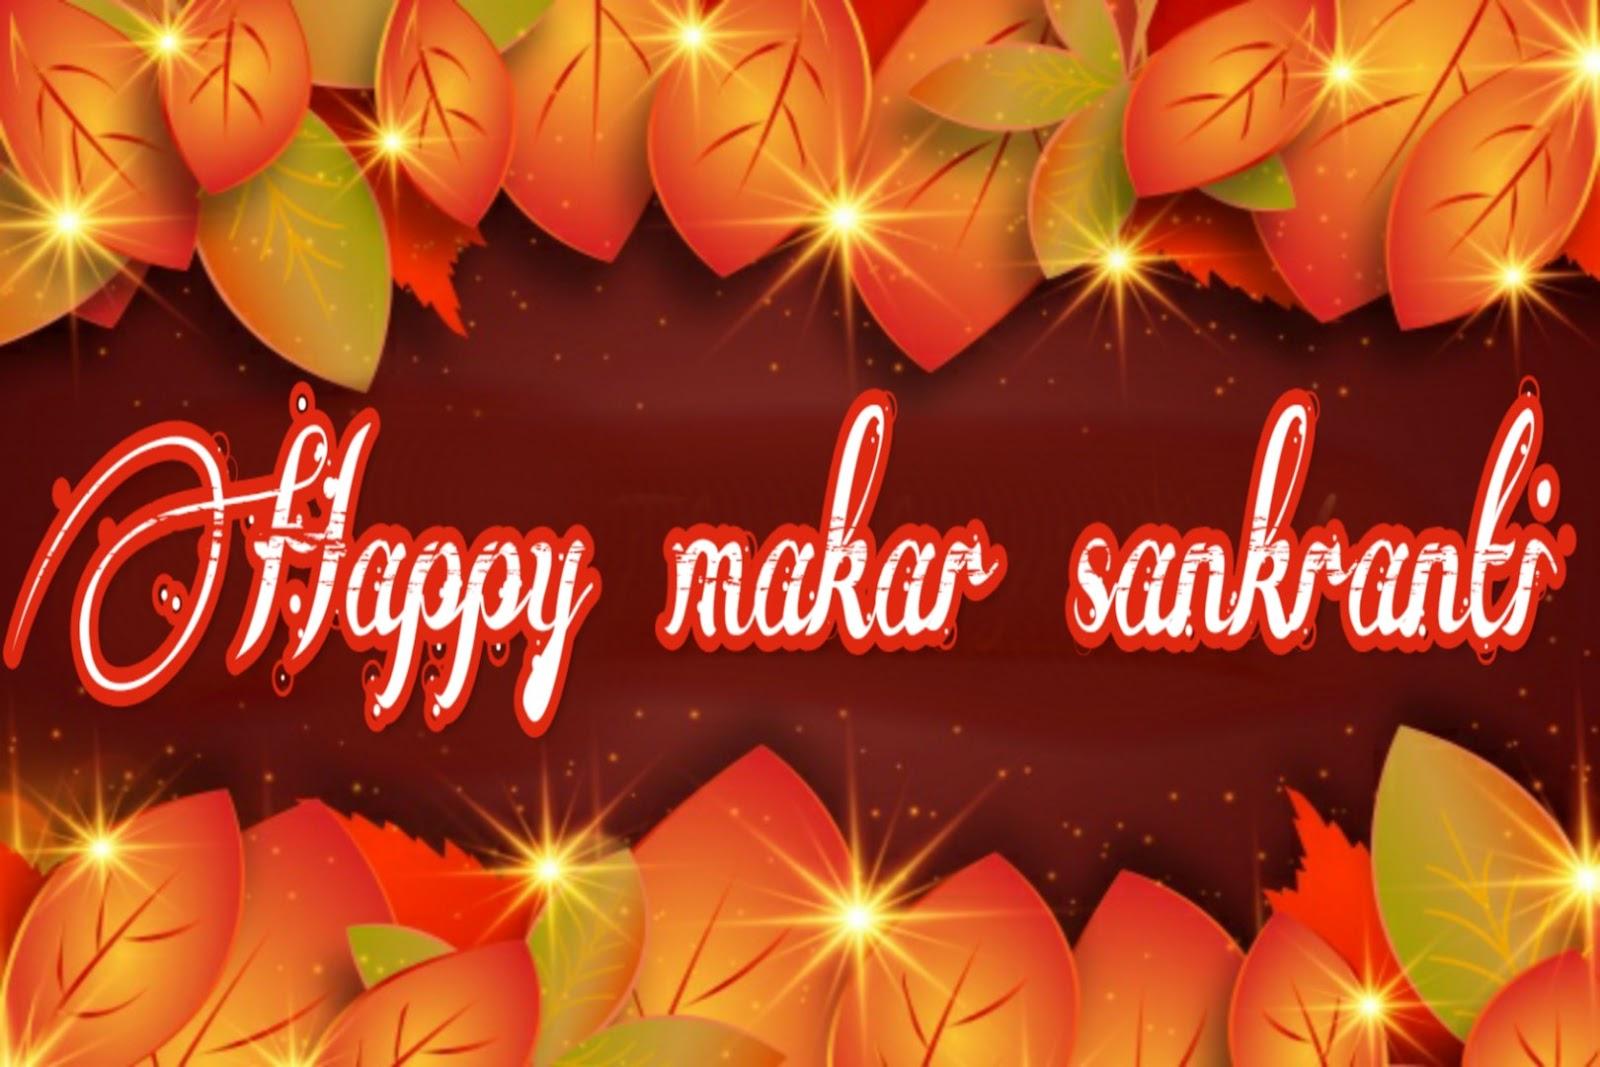 005 Essay Example Makar Sankranti In Hindi Surprising Pdf Download 2018 Full